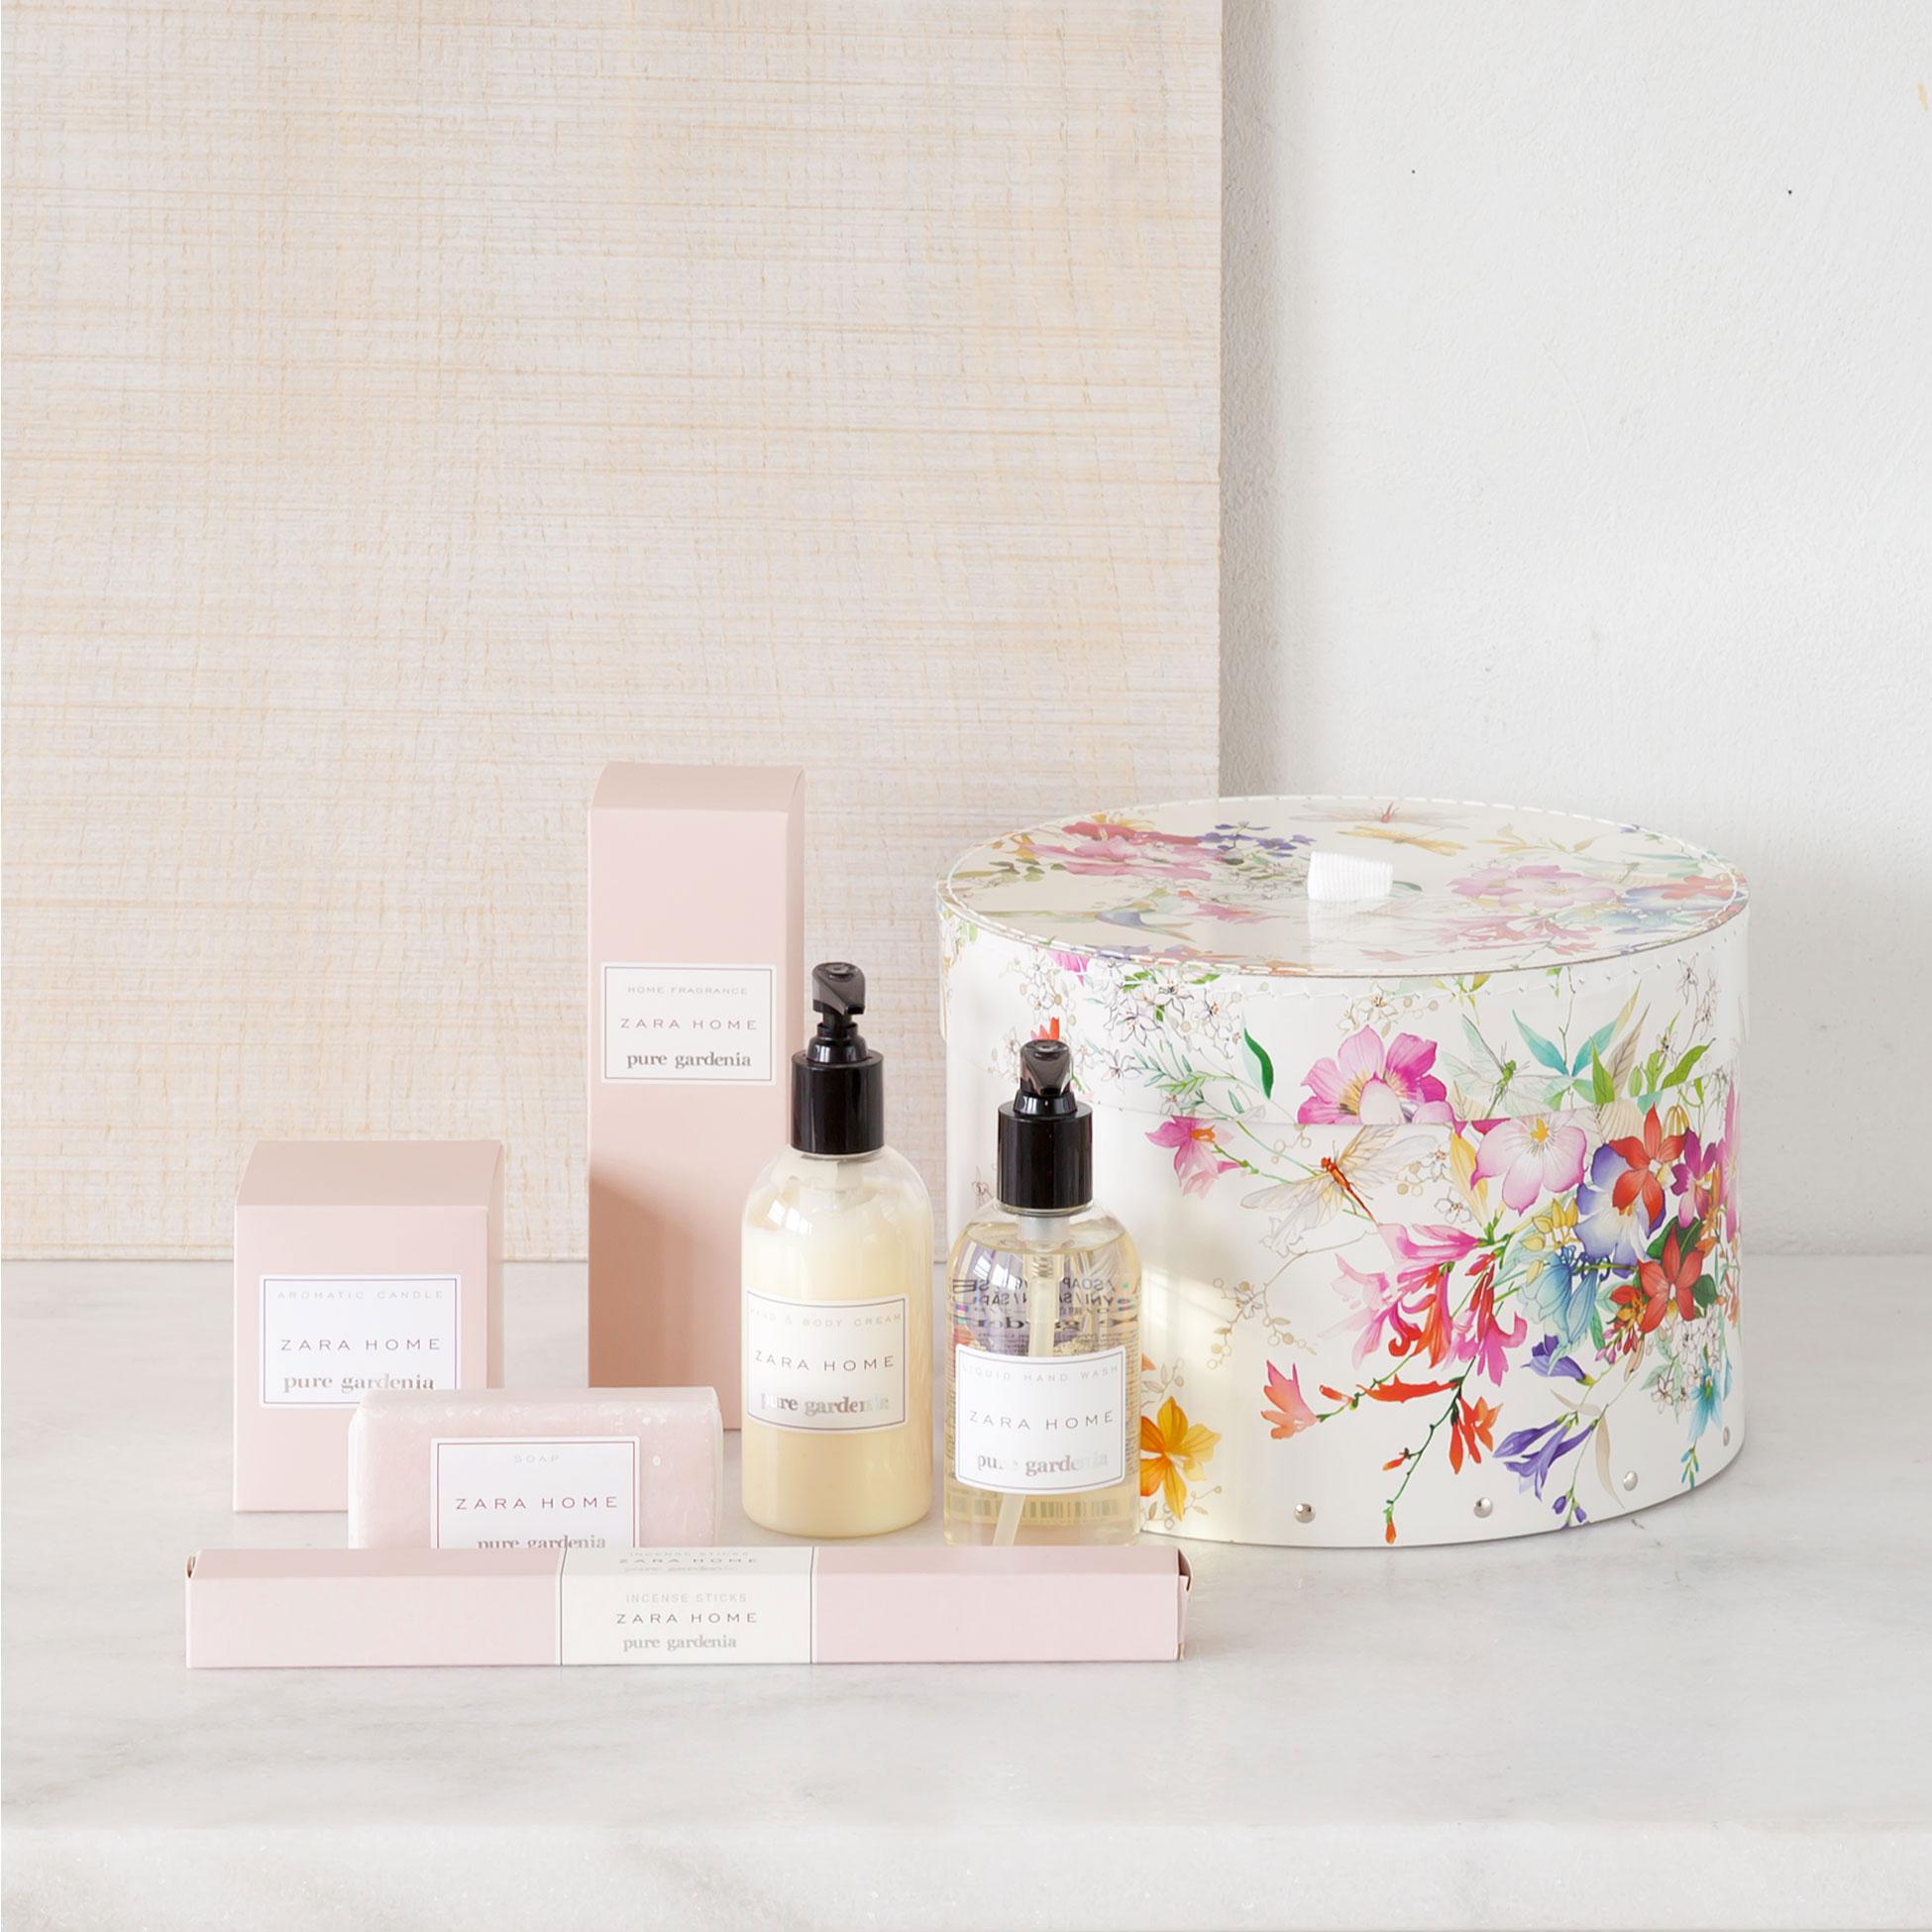 Coffret salle de bain, Zara Home, 55,94€